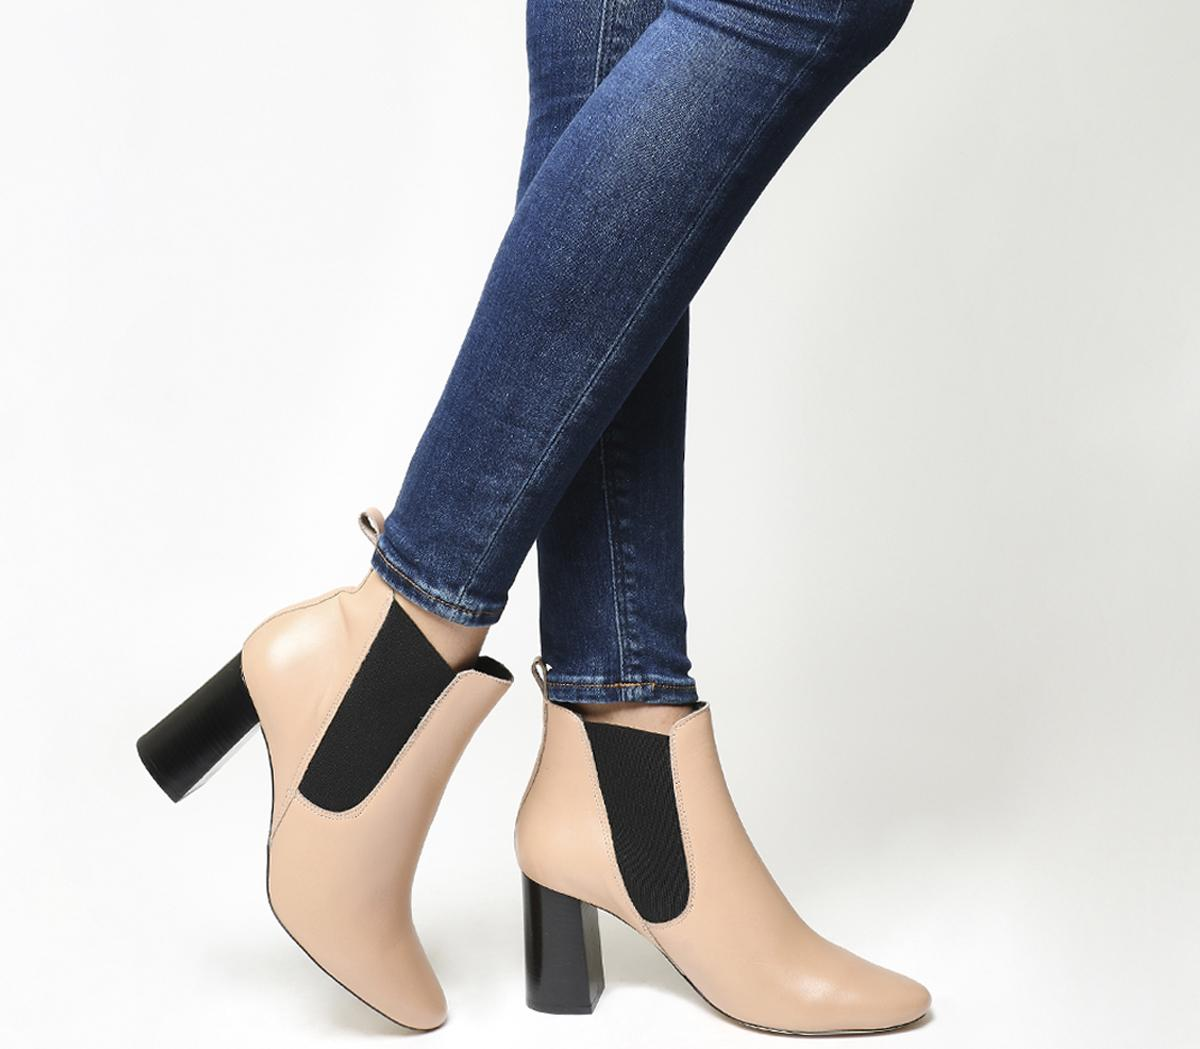 Autumn Block Heel Chelsea Boots